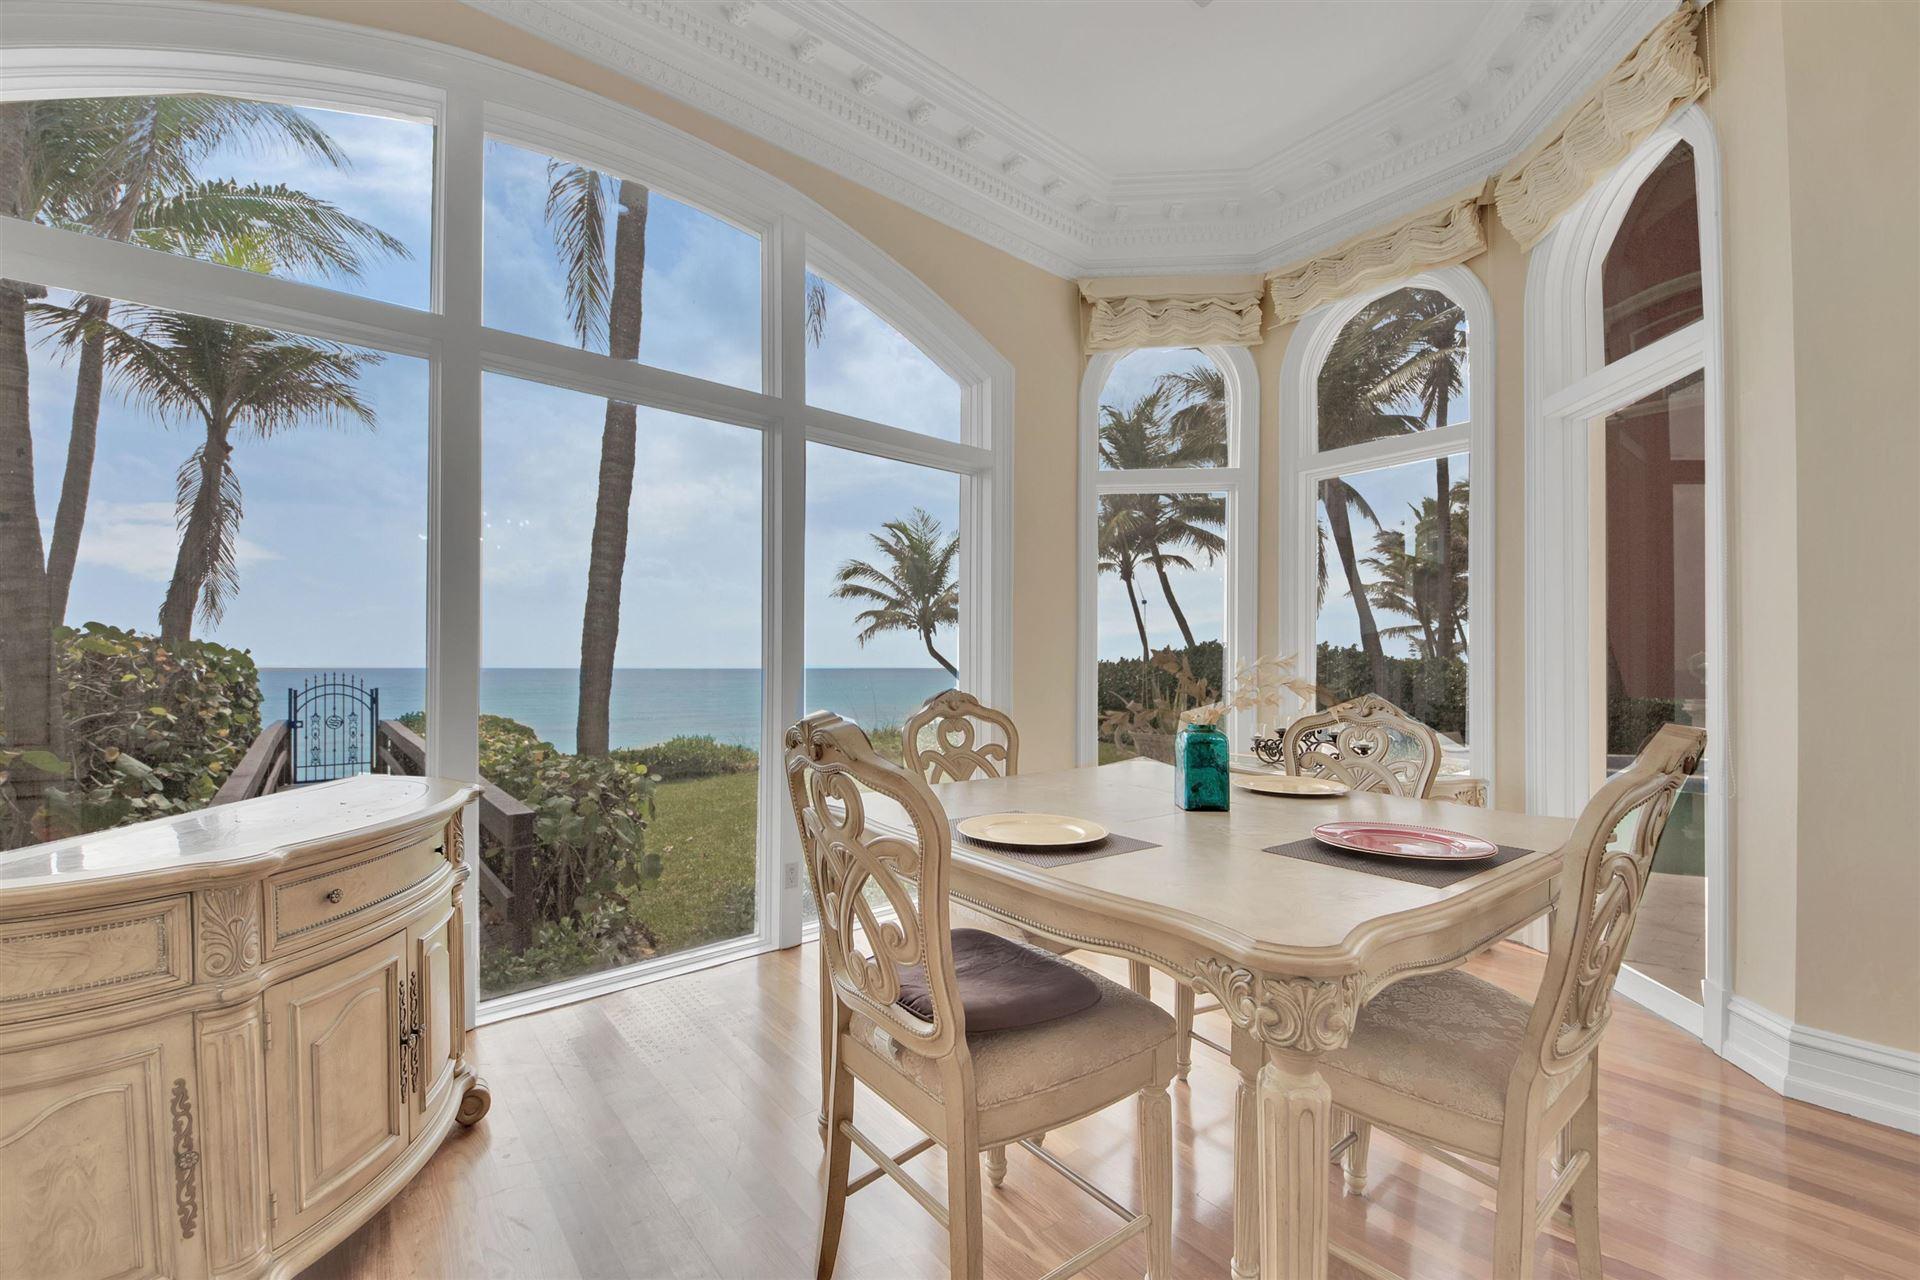 Photo of 5 Ocean Place, Highland Beach, FL 33487 (MLS # RX-10724502)